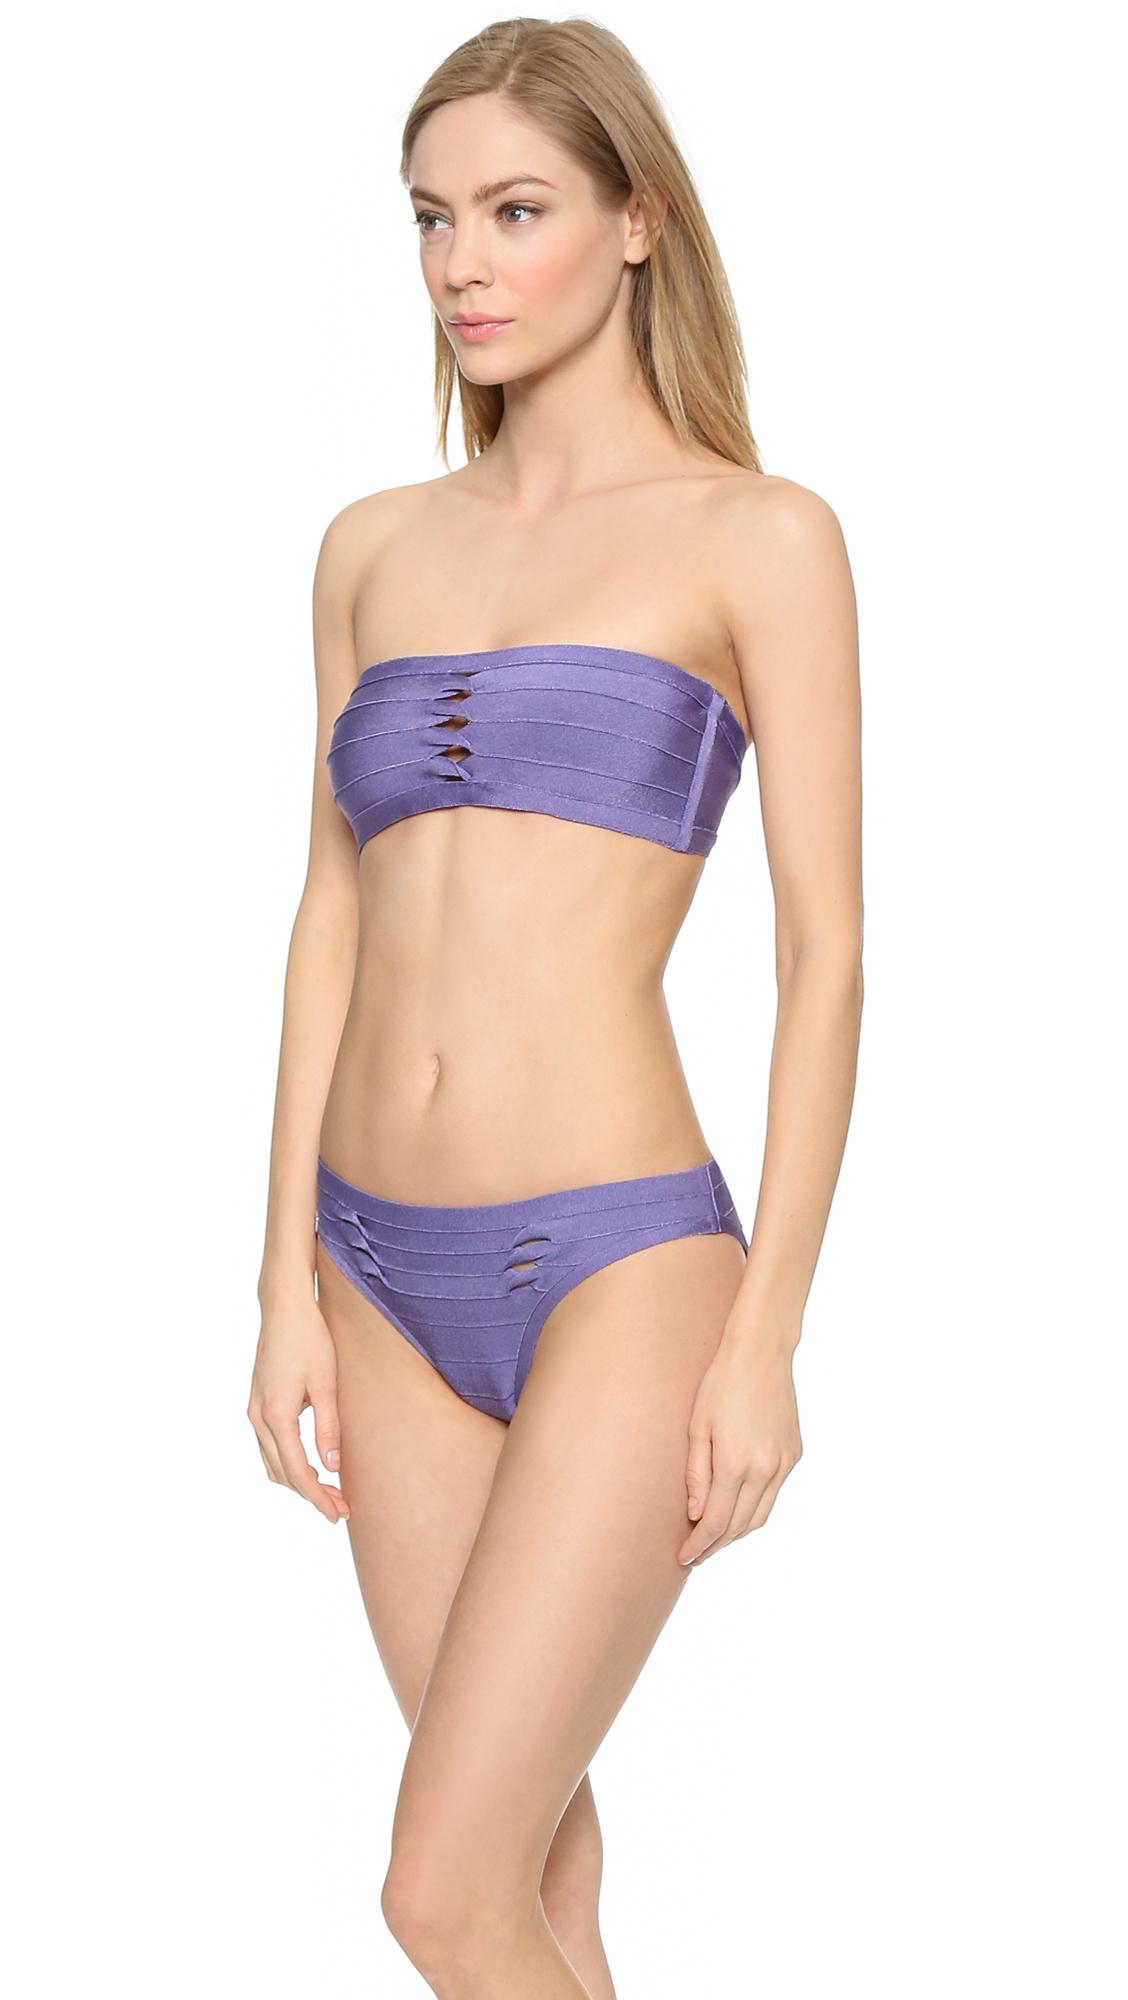 5680ac005821 Lyst - Hervé Léger Irina Bandeau Bikini Top - Lilac in Purple